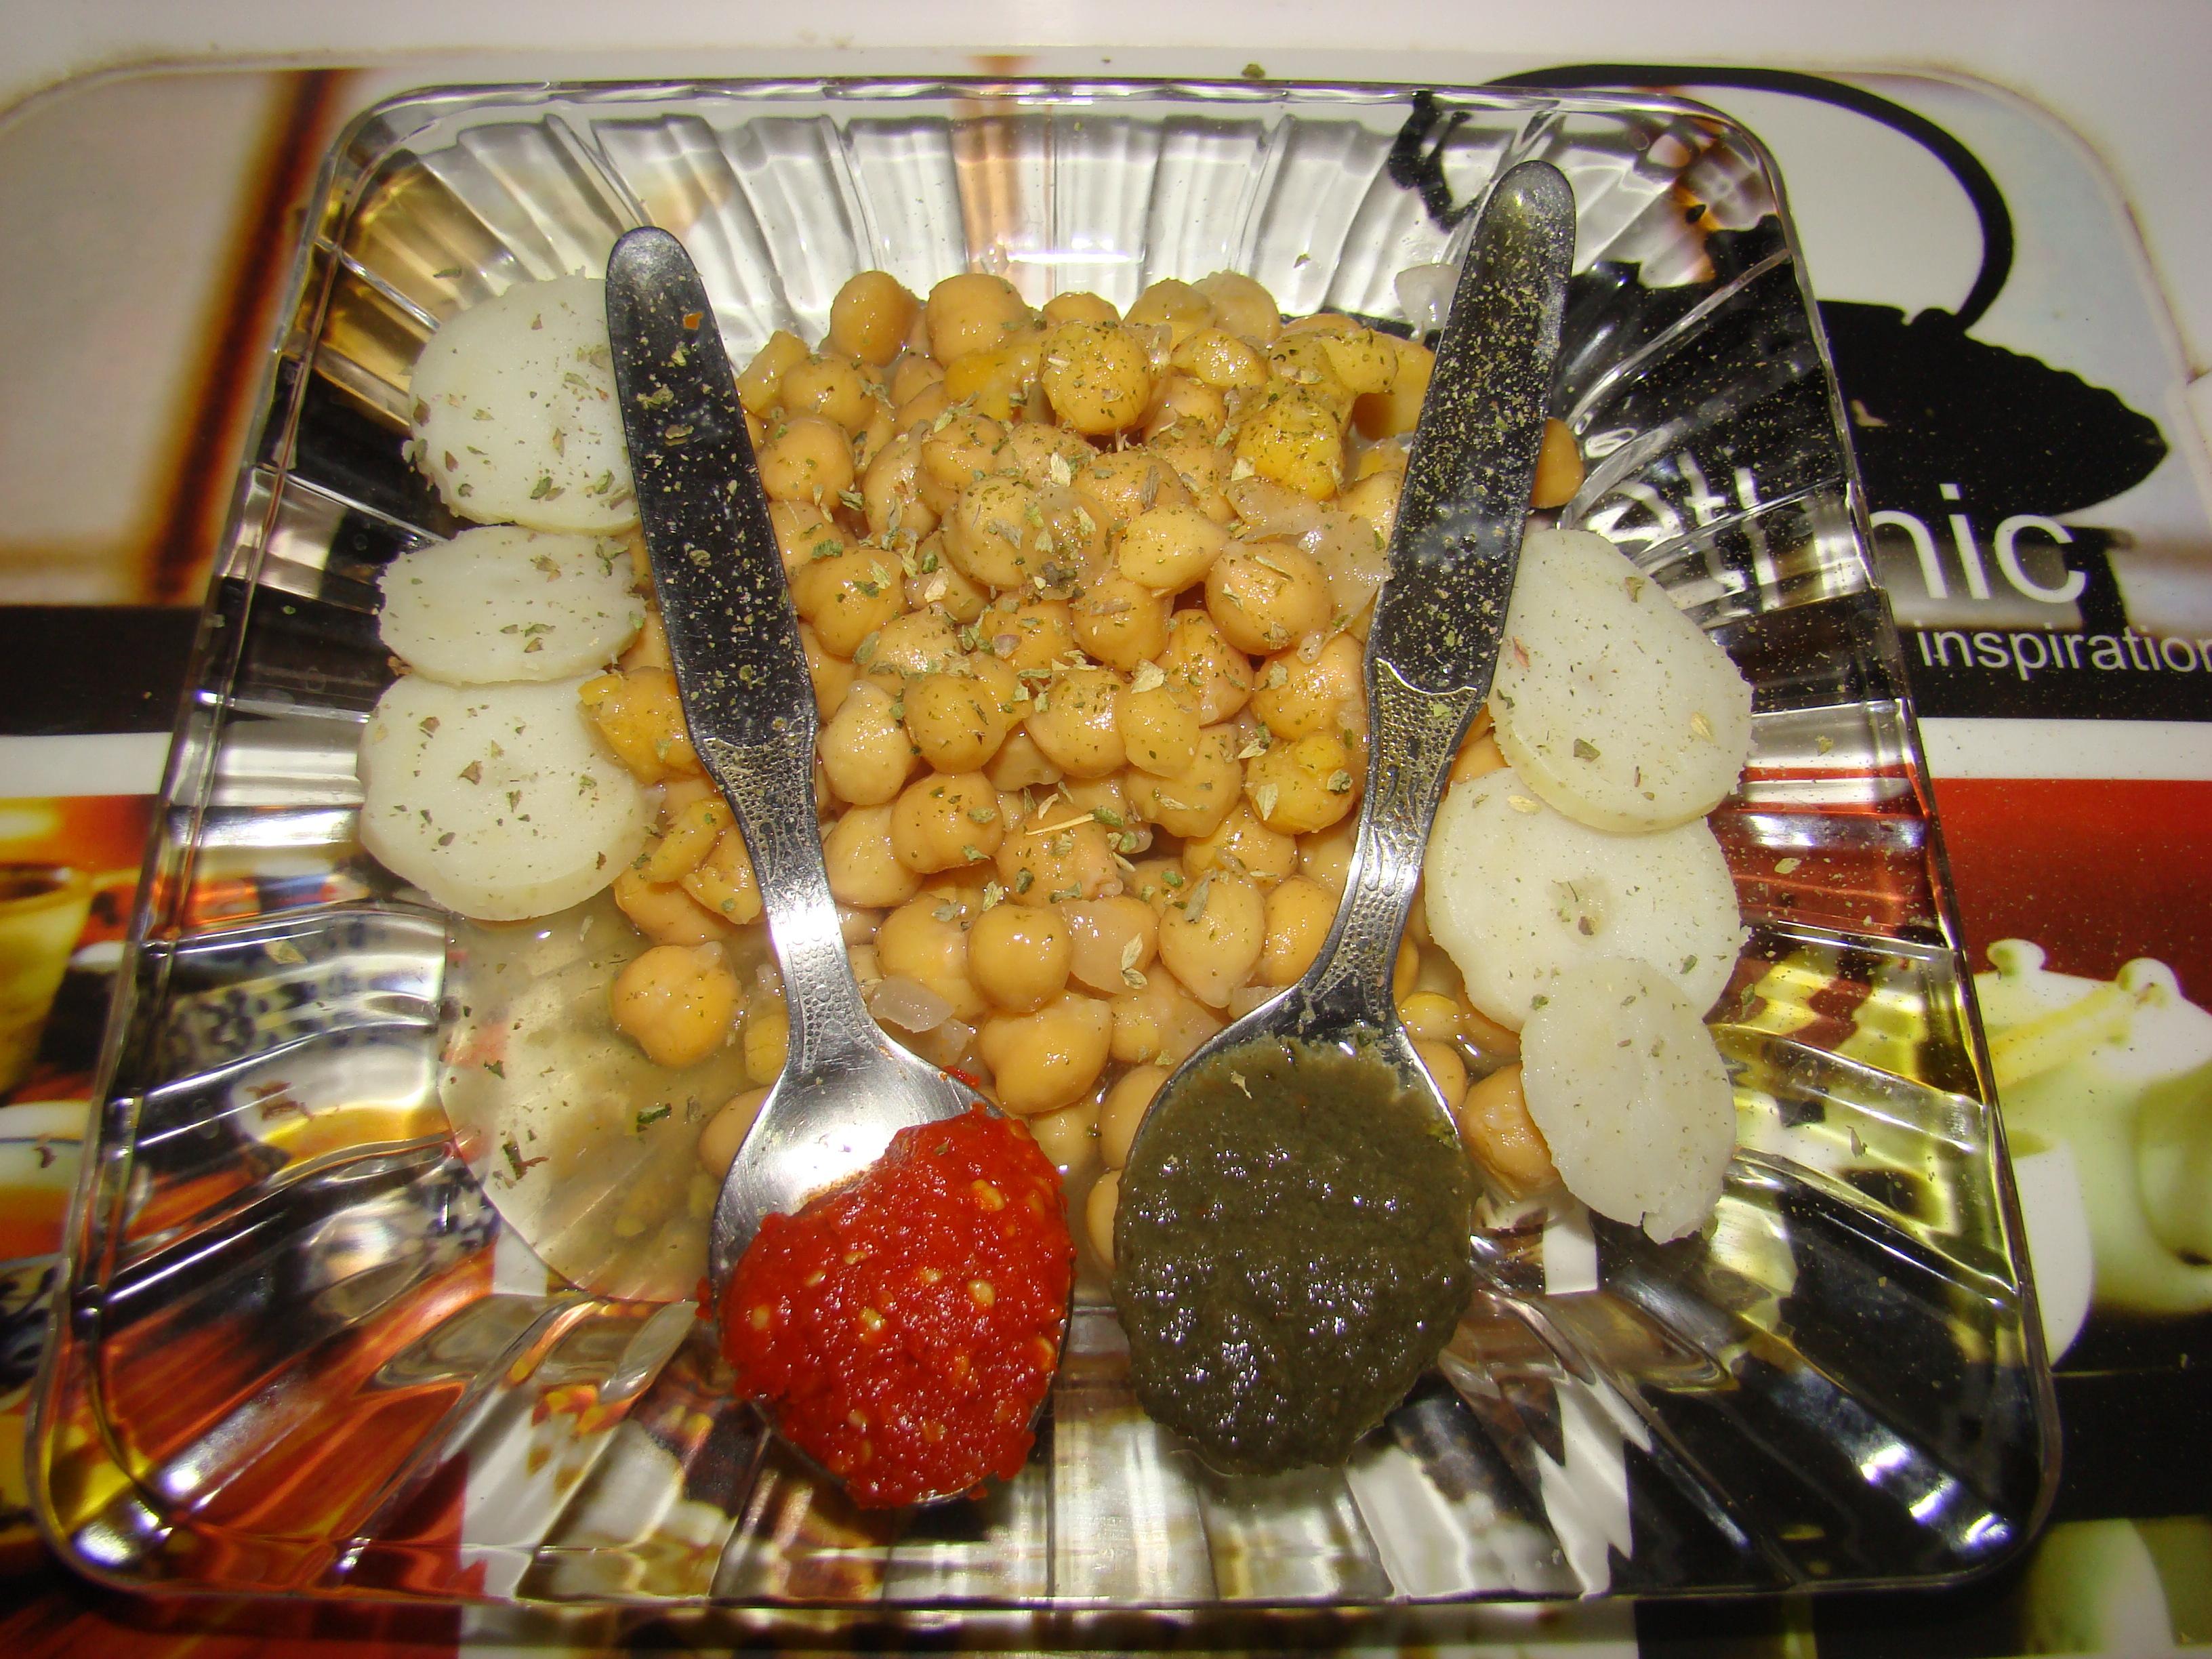 Shornakhod ziba kitchen dast pukht afghani gallery video forumfinder Image collections